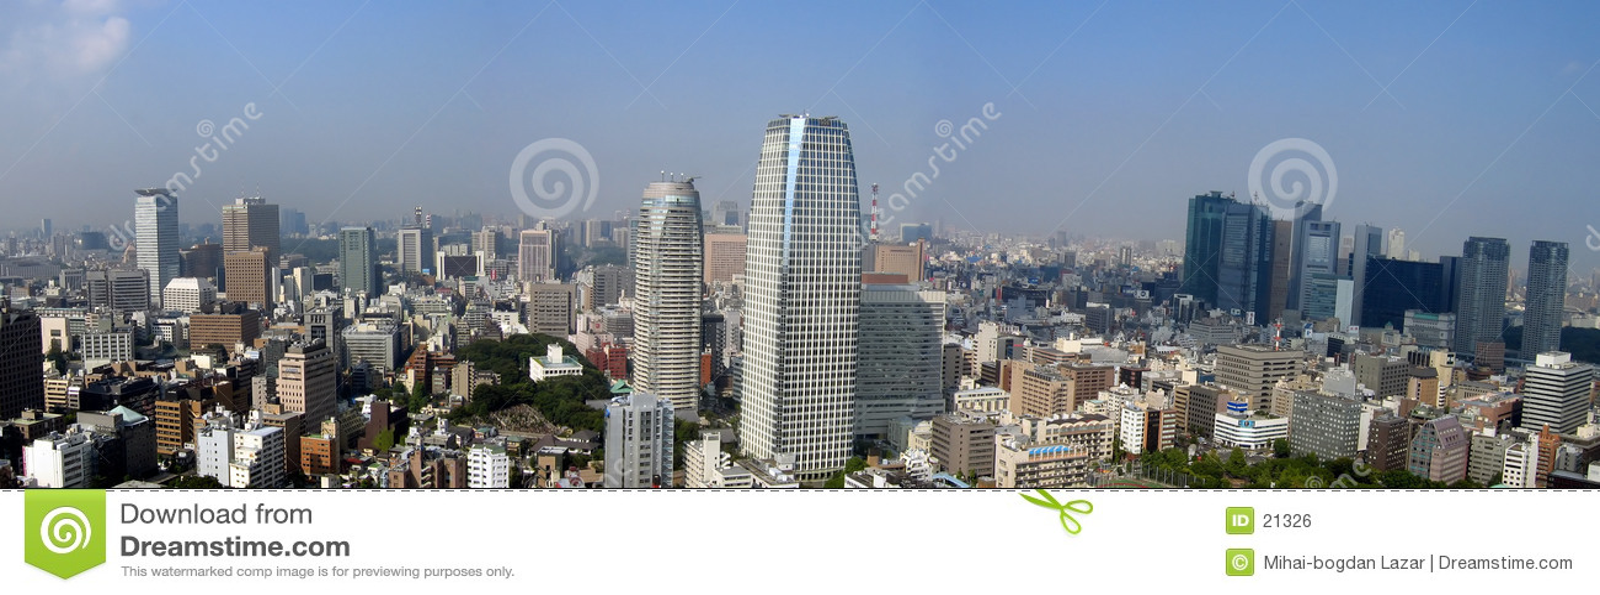 Tokyo panoramic view